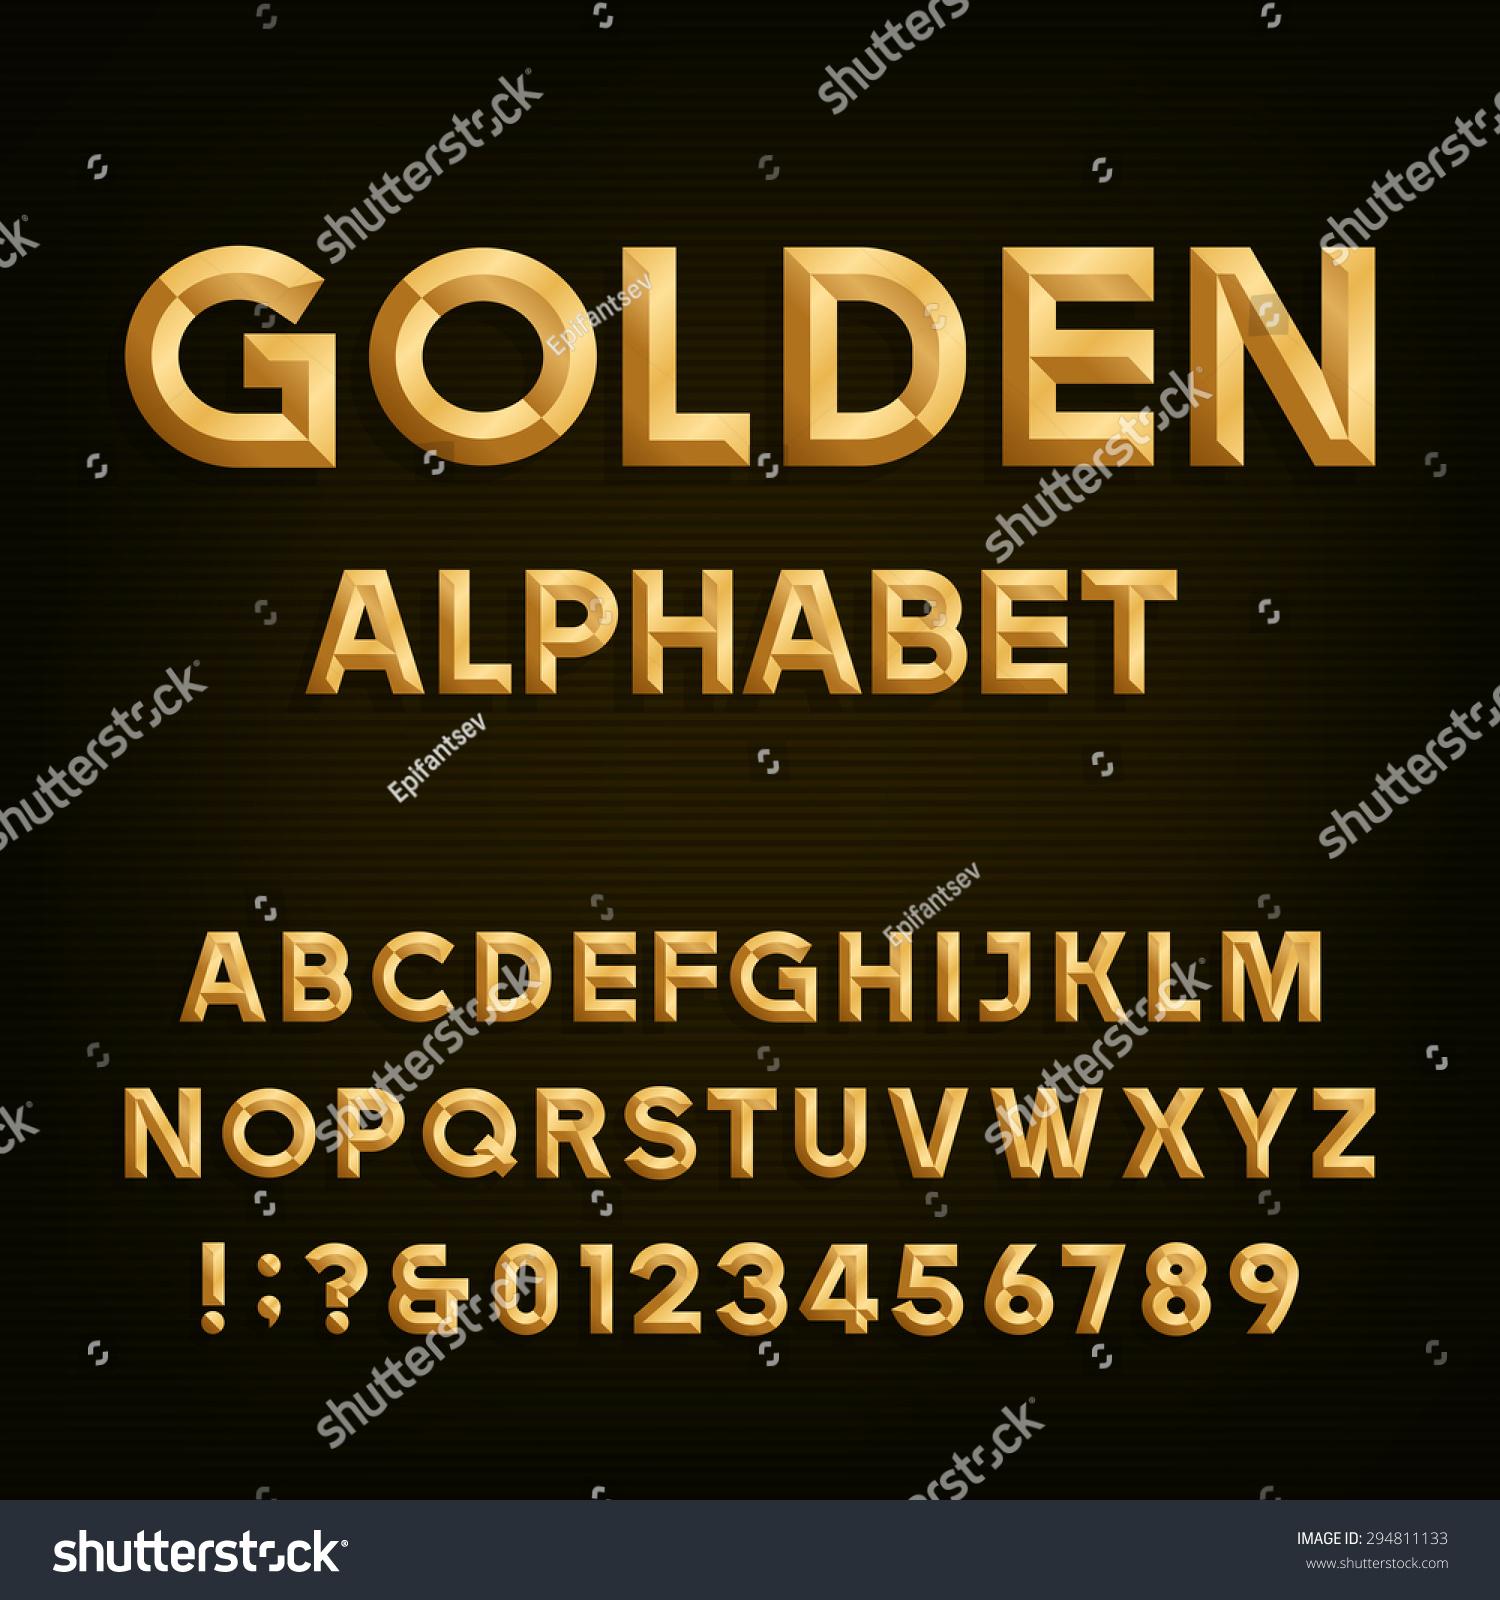 Alphabet Collection In Golden Color:  Golden Beveled Font Vector Alphabet Gold Stock Vector